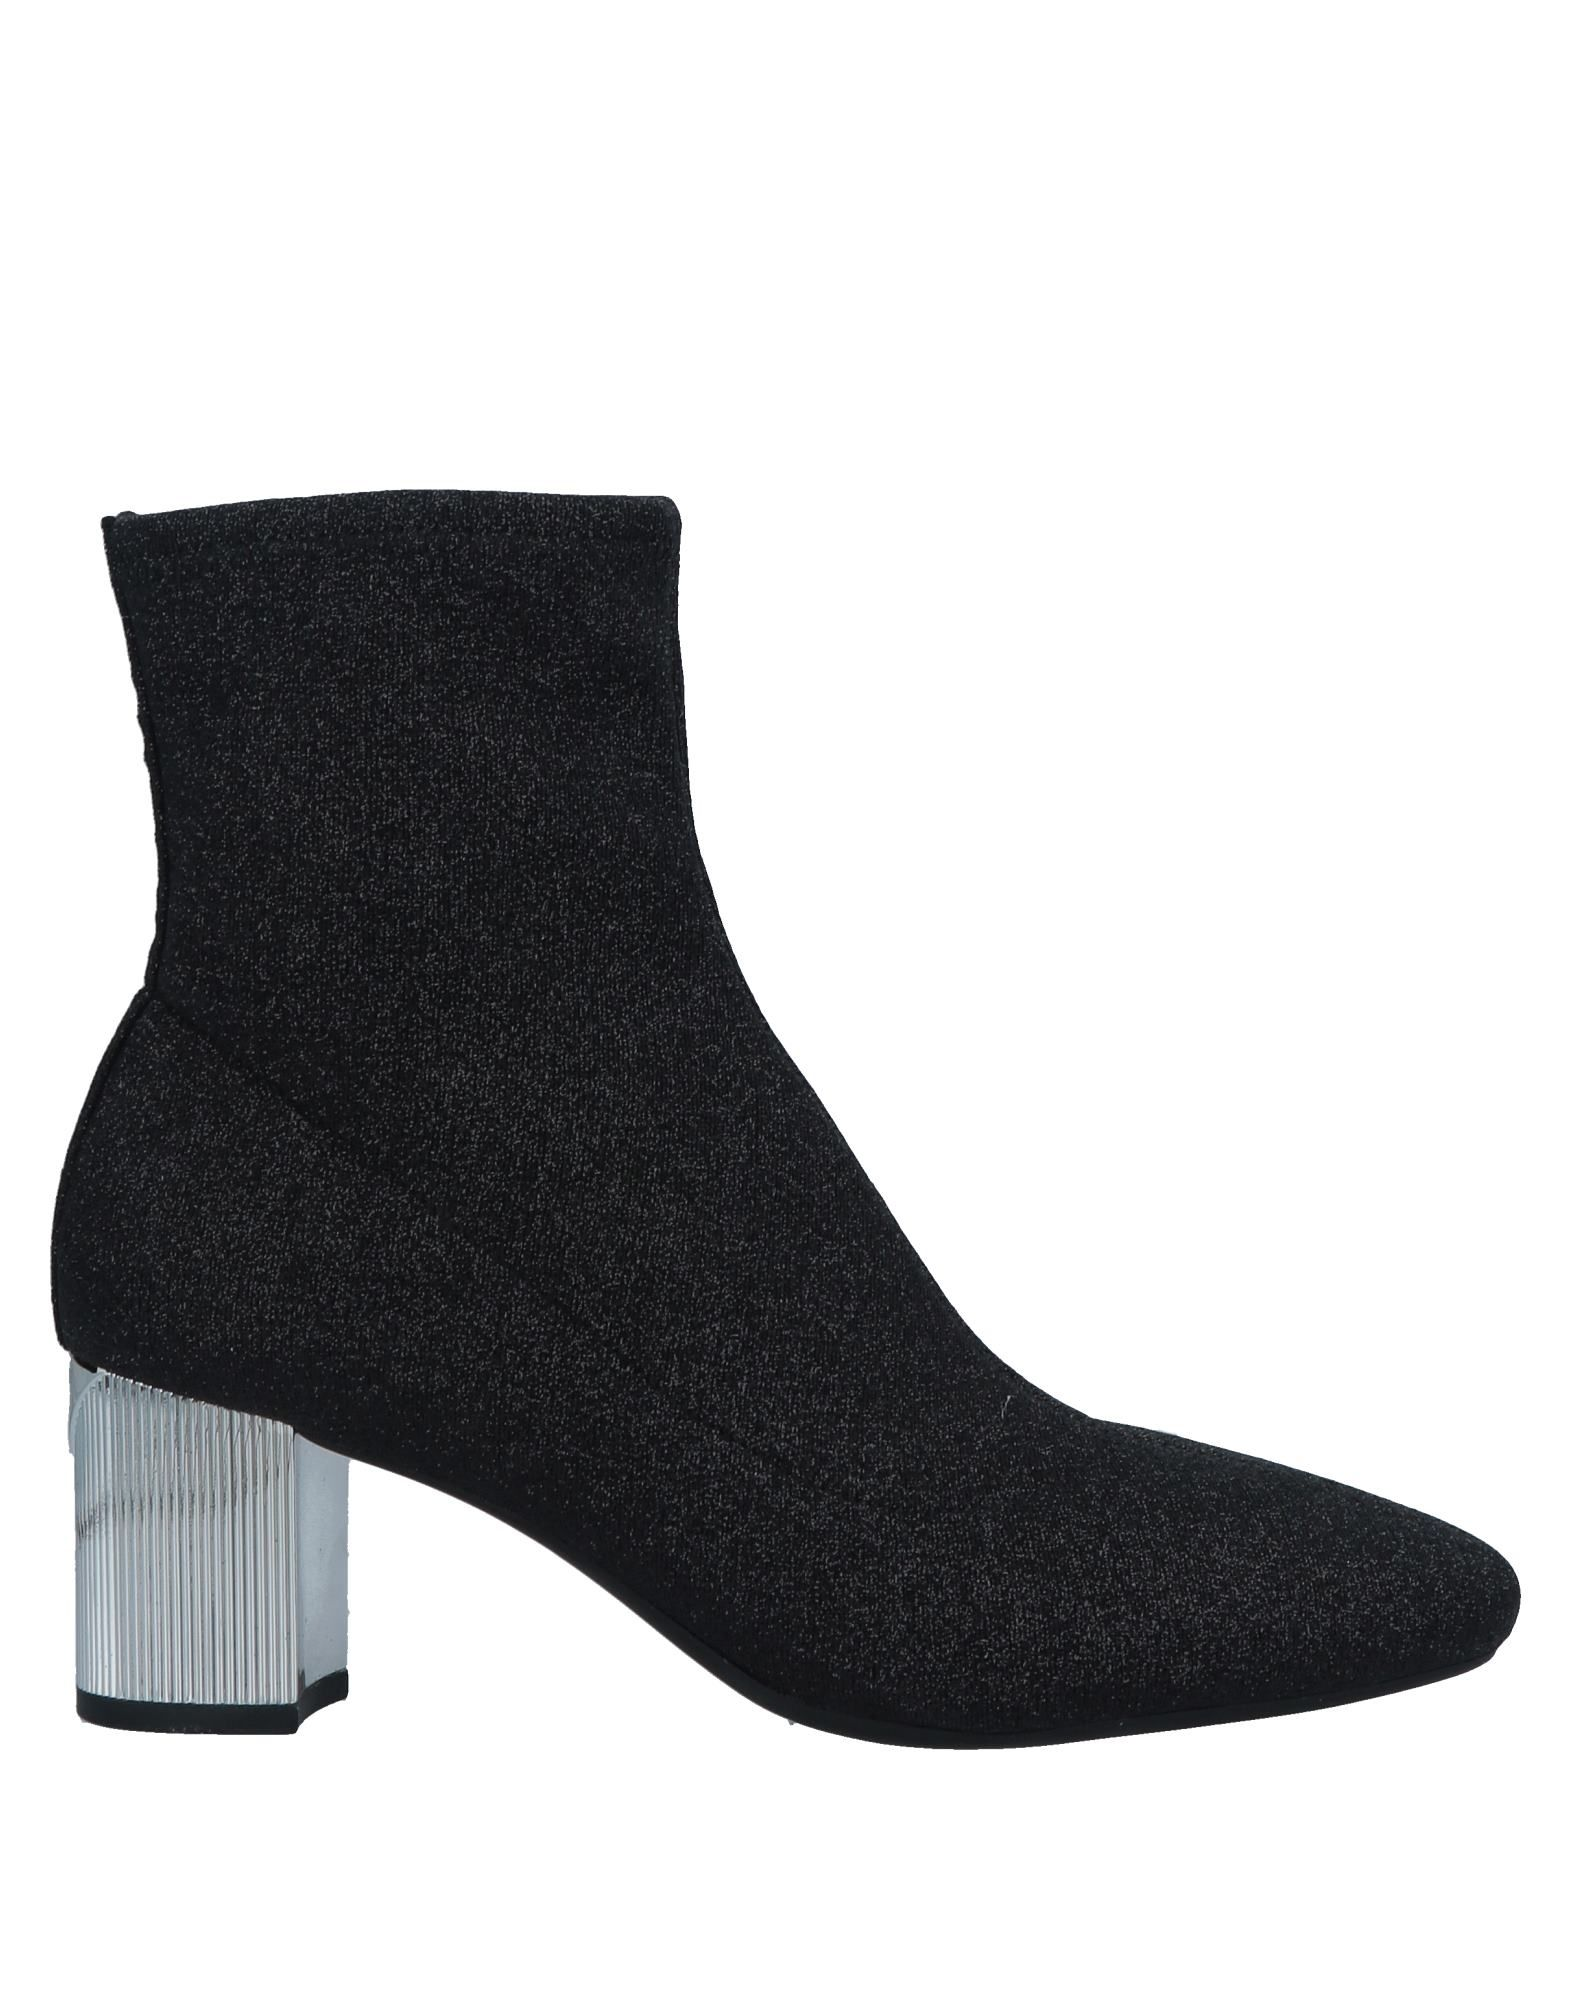 MICHAEL MICHAEL KORS Полусапоги и высокие ботинки ботинки michael michael kors